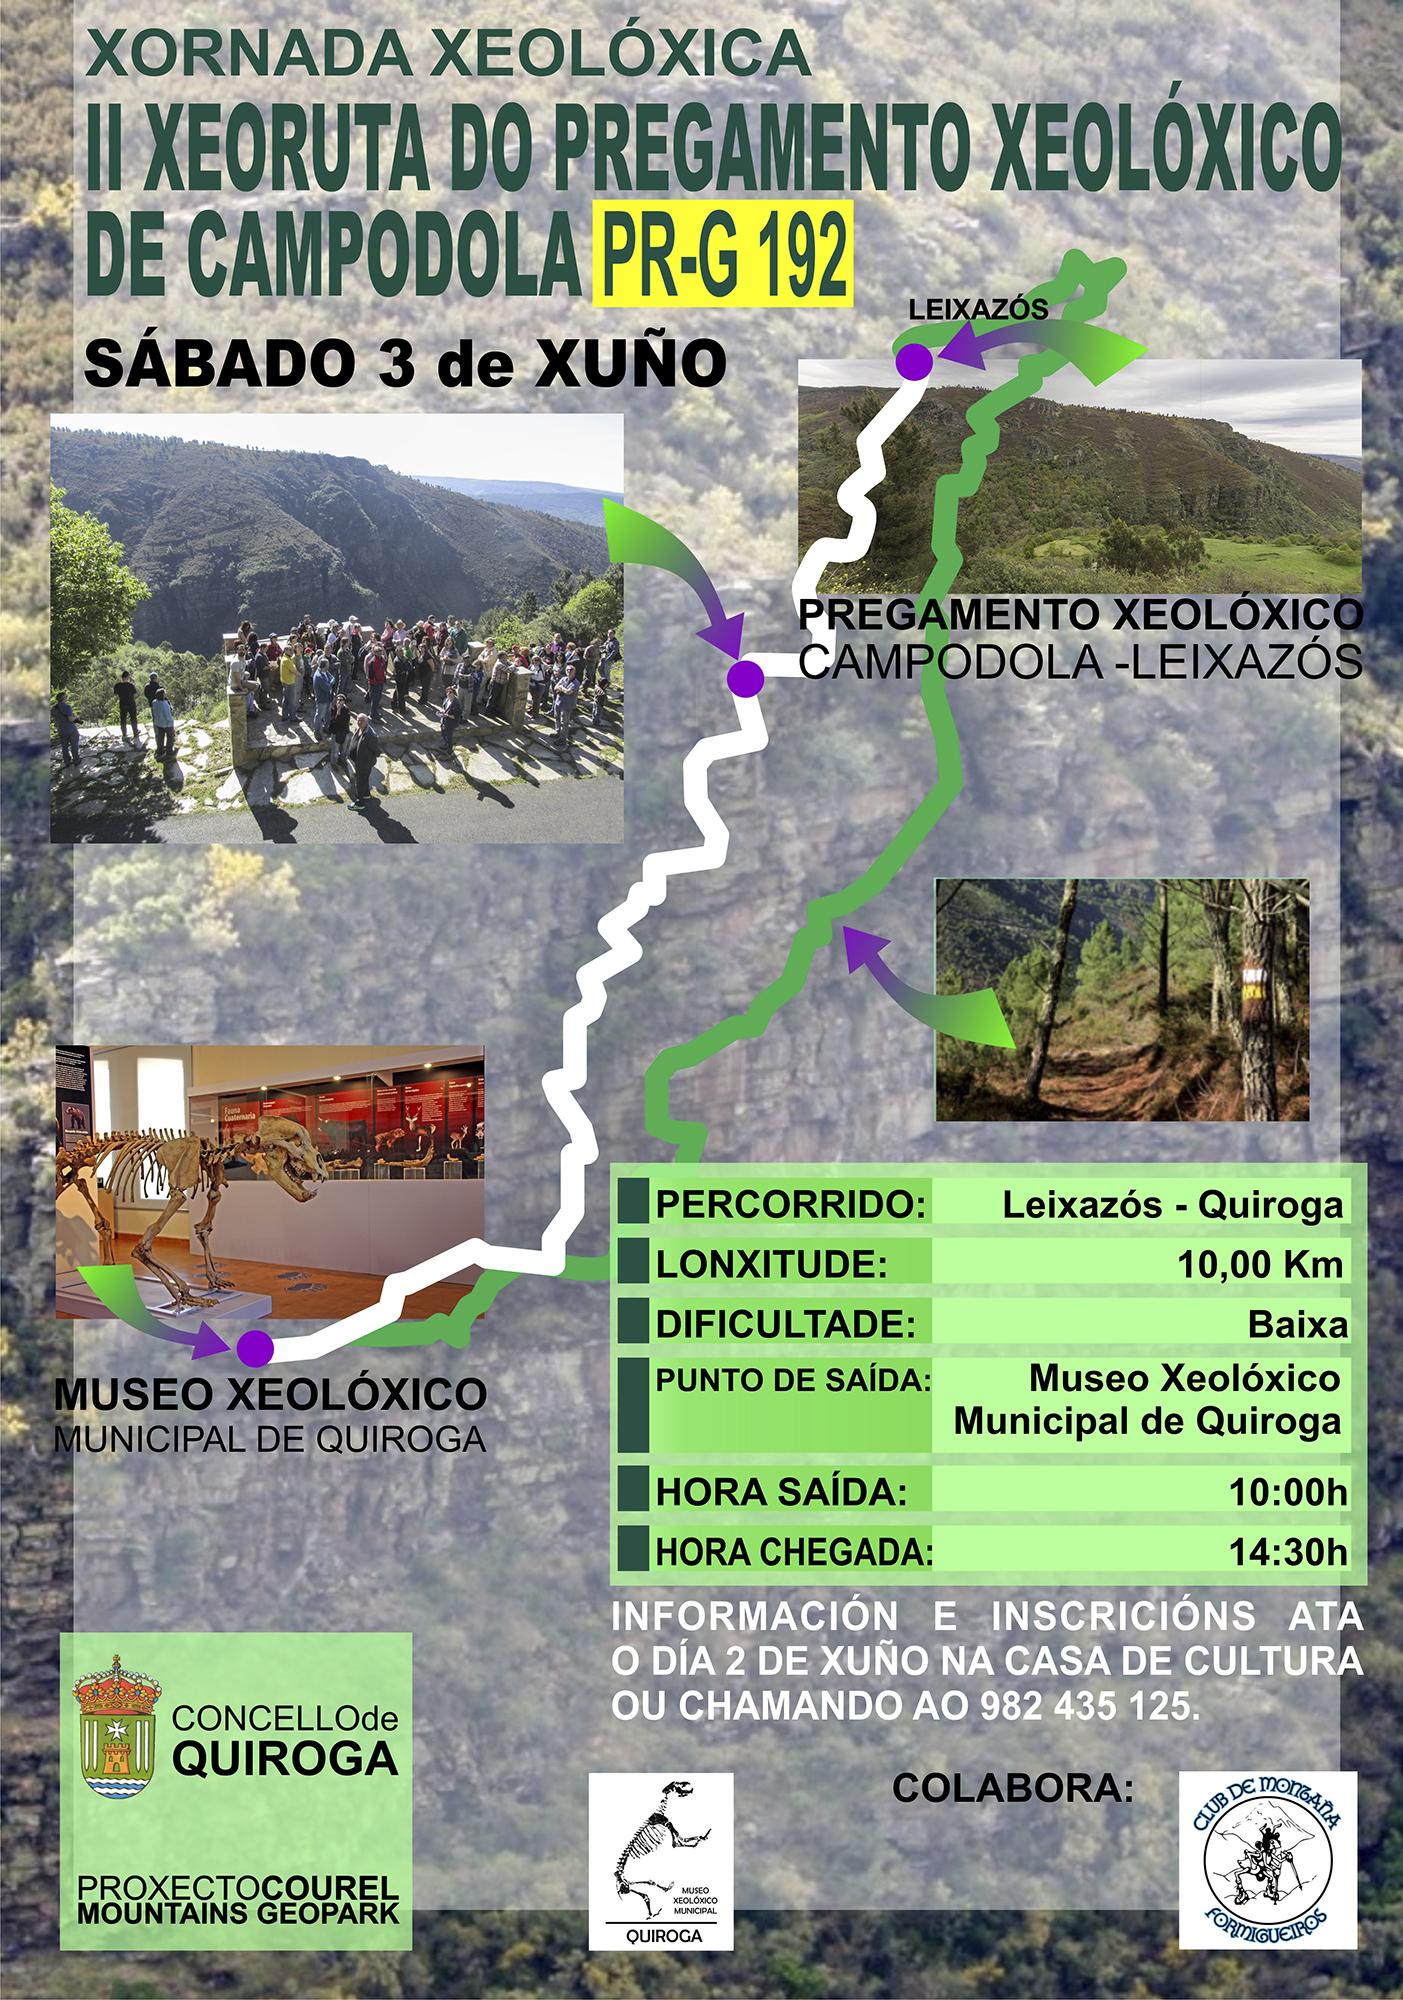 Cartel de la II Georuta del Sinclinal de la Sierra do Courel